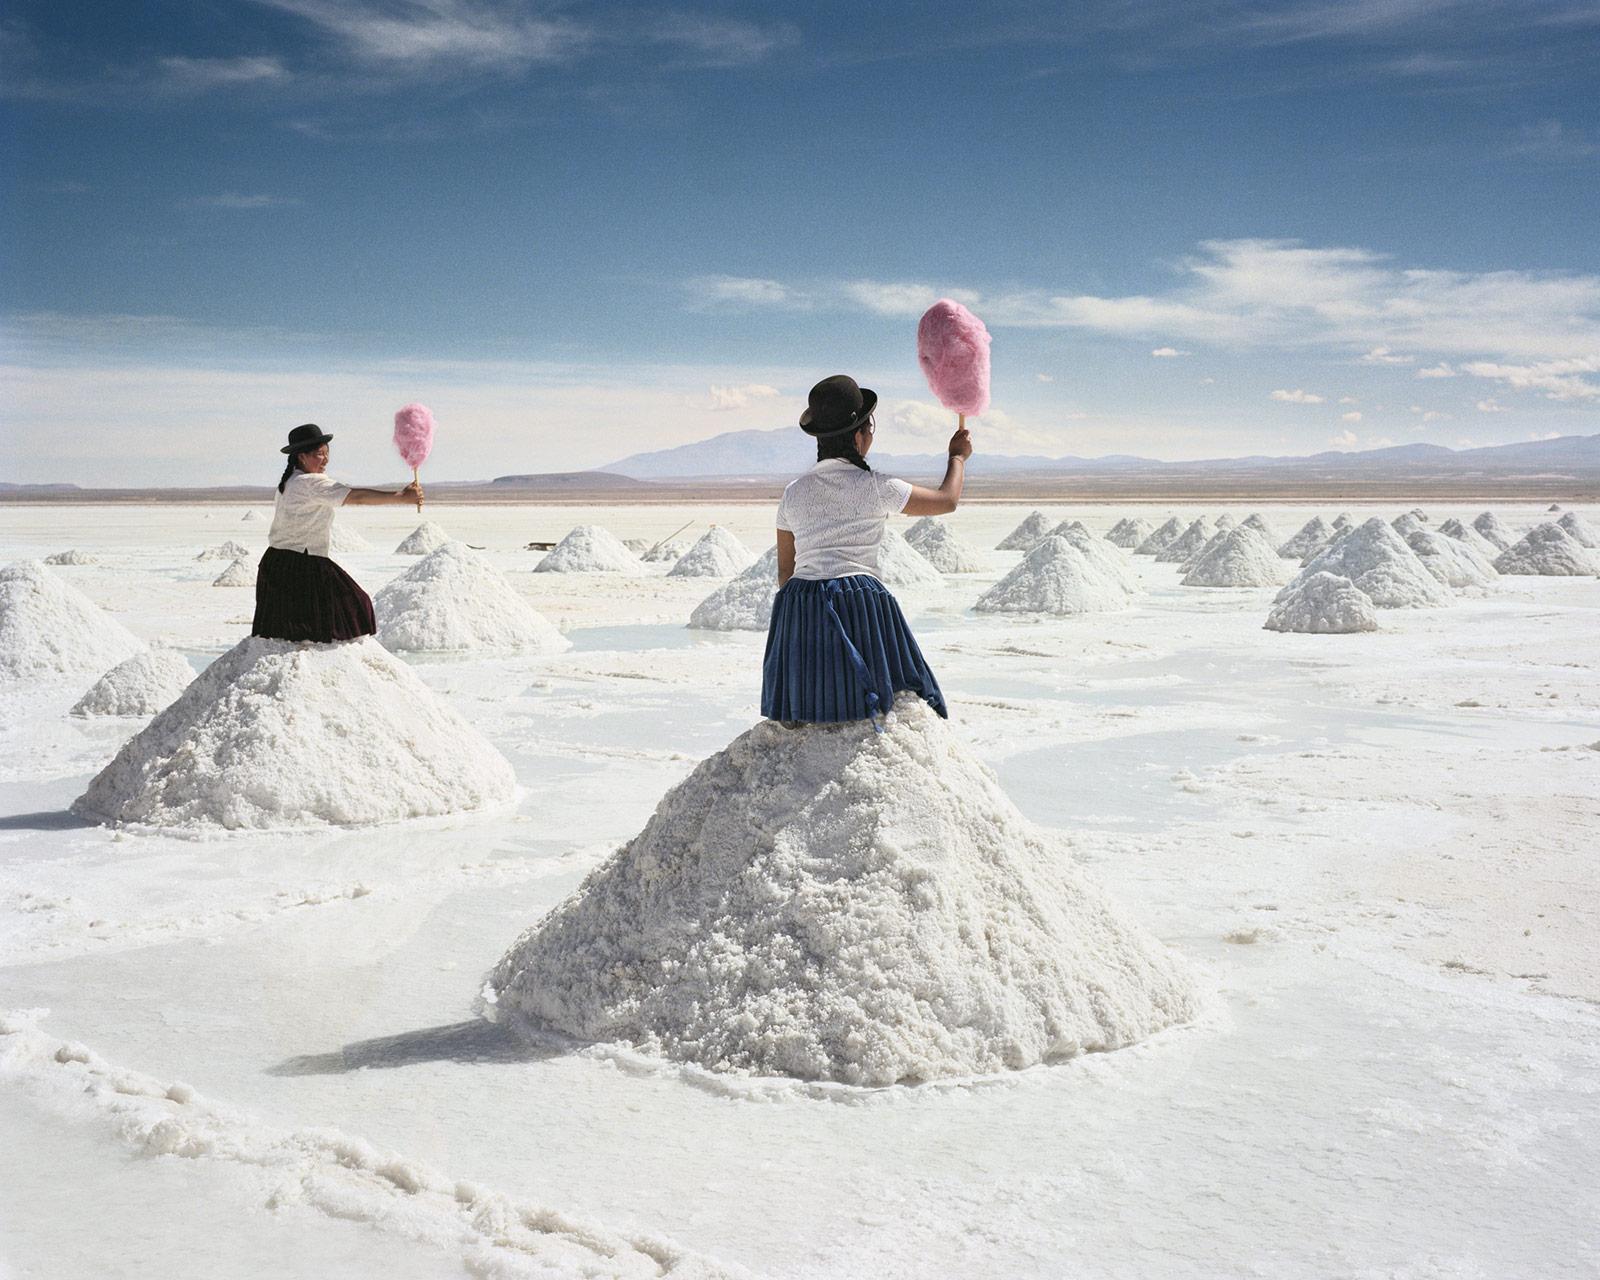 Il surrealismo nelle fotografie di Scarlett Hooft Graafland